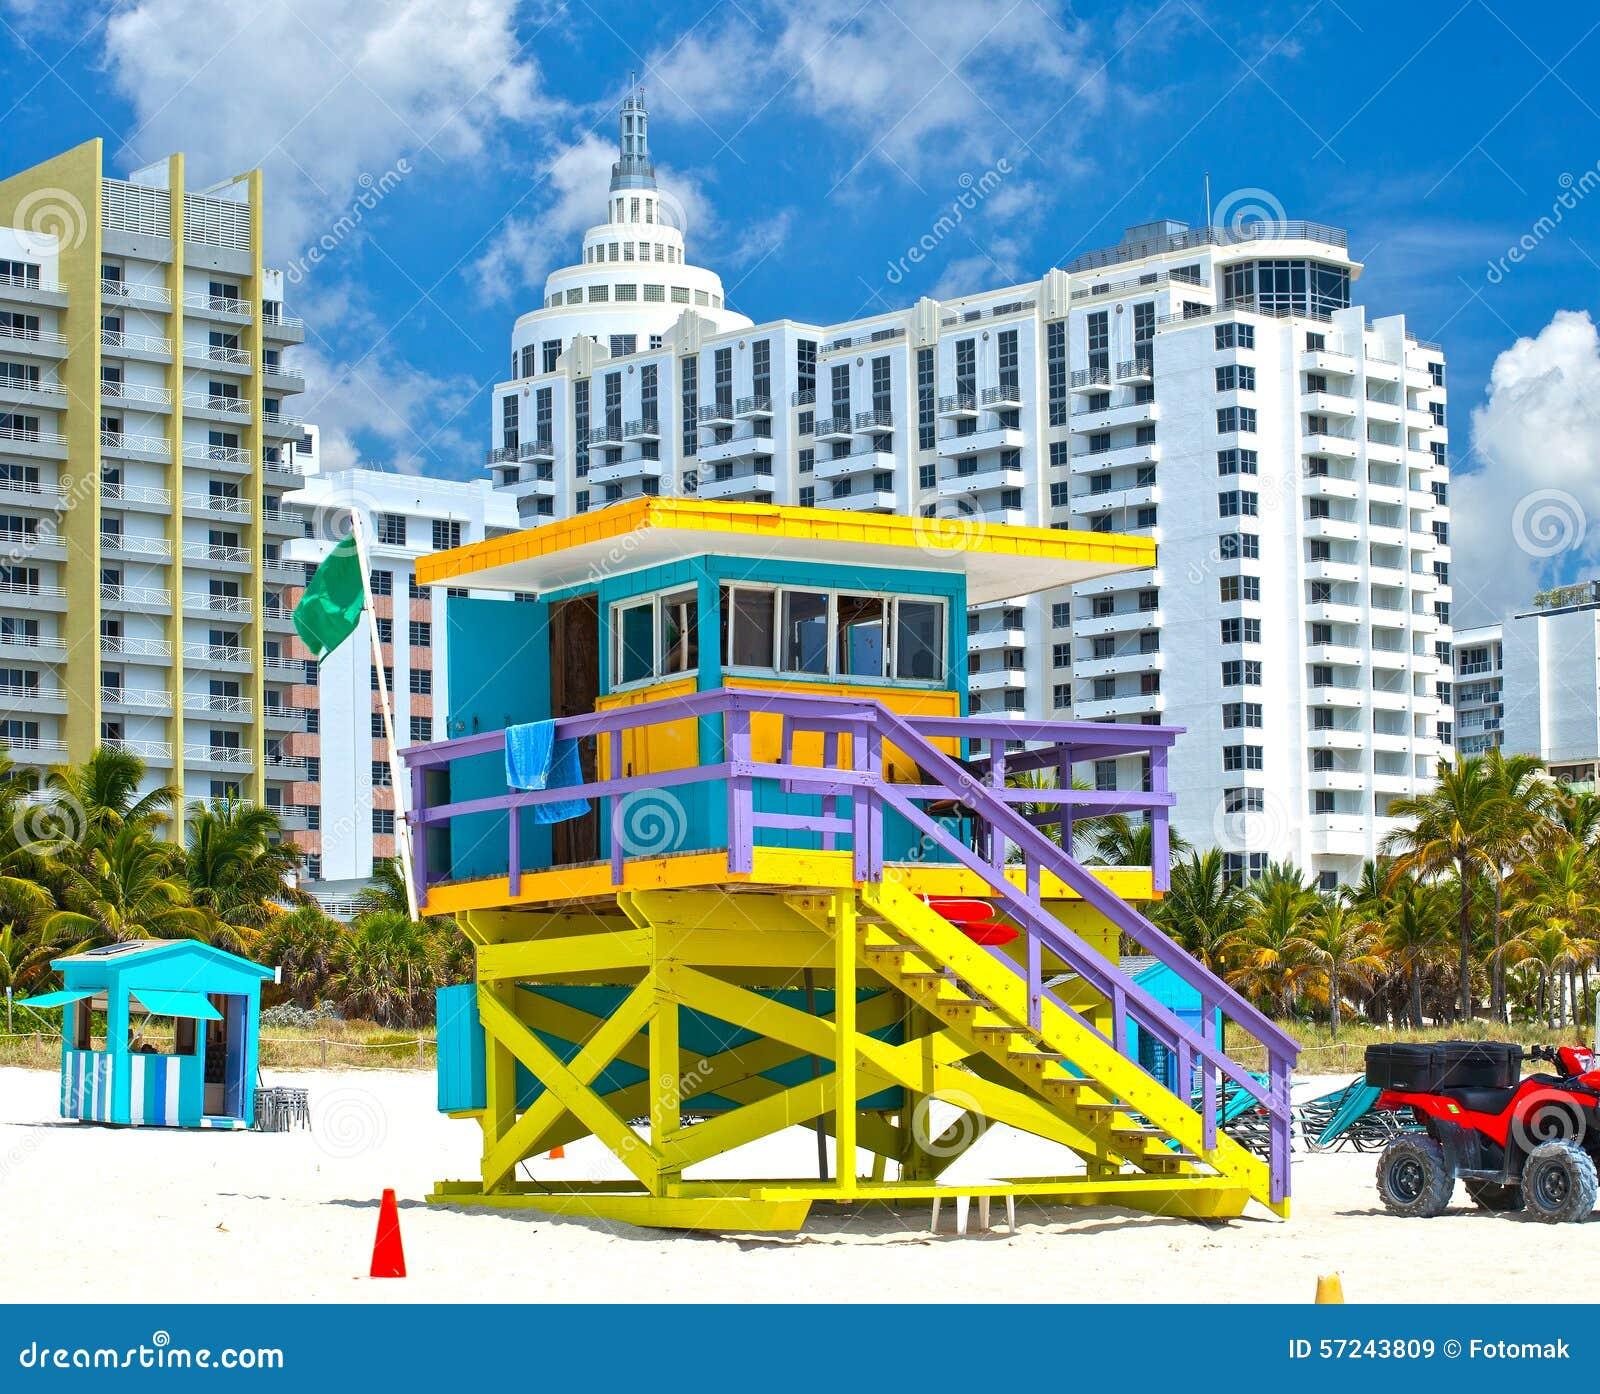 Miami, FL Valentines Day Events | Eventbrite